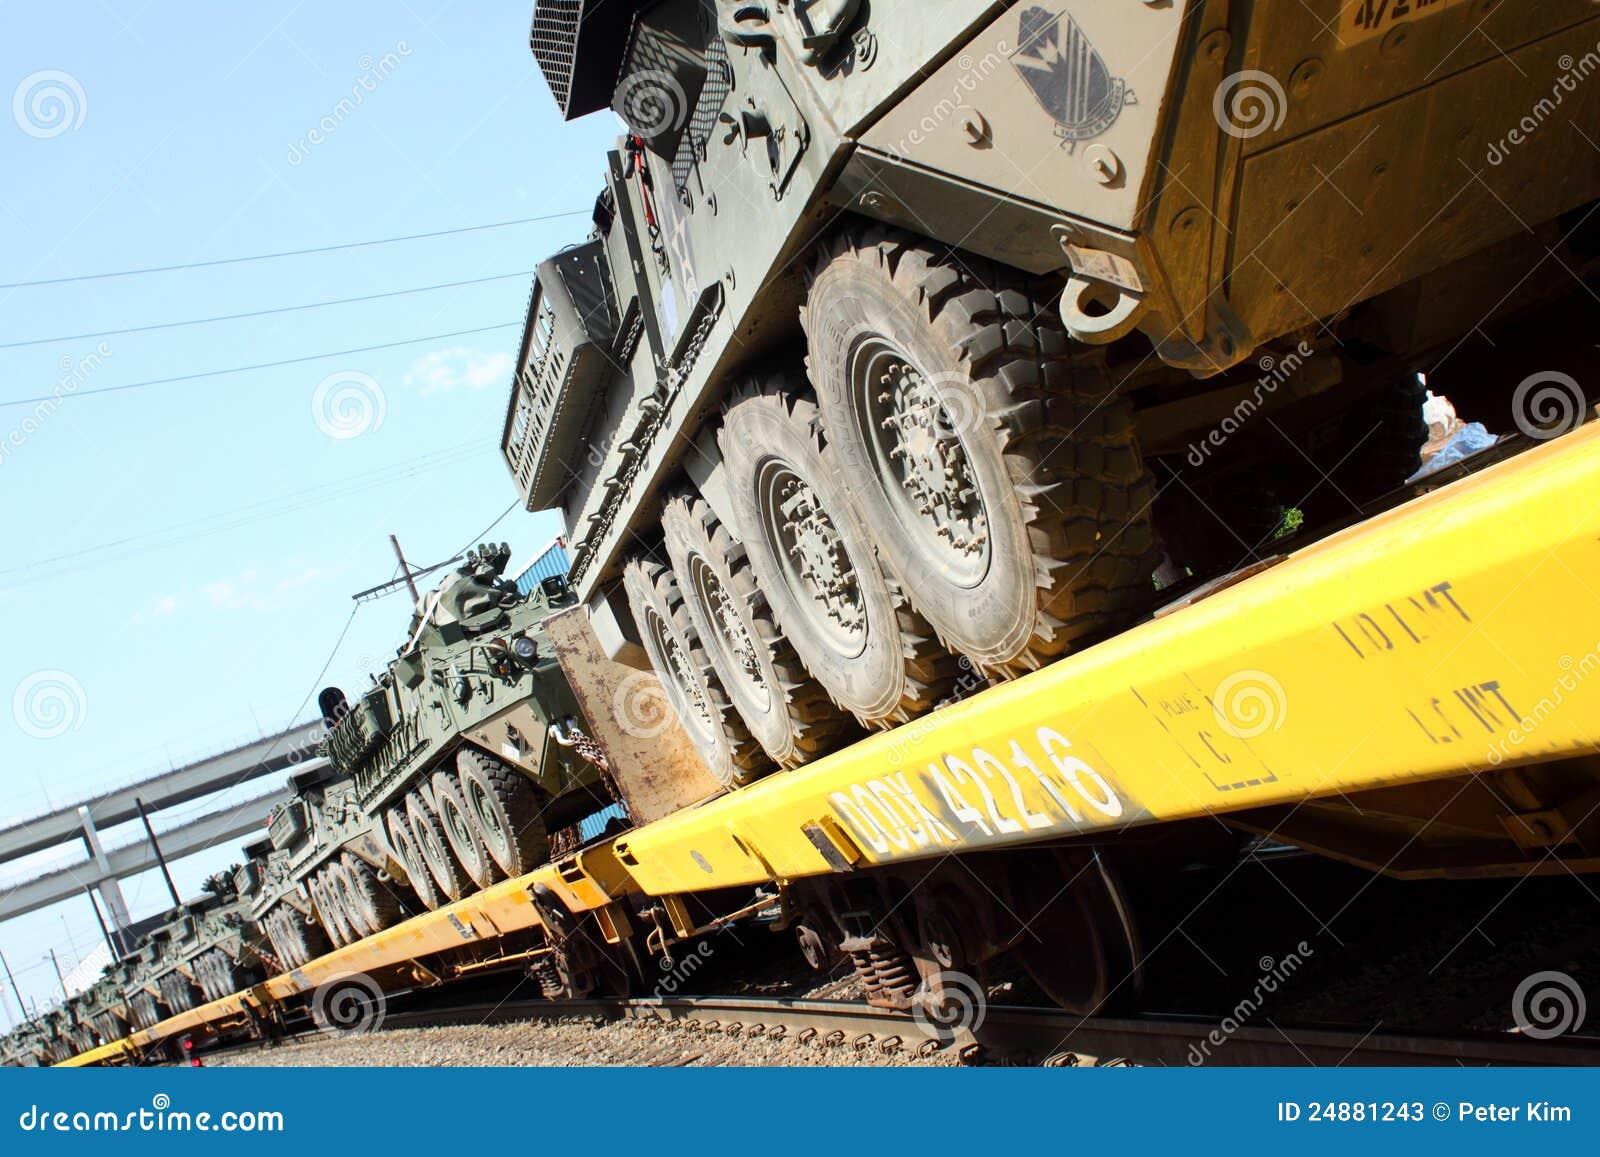 Combóio da estrada de ferro de veículos militares.